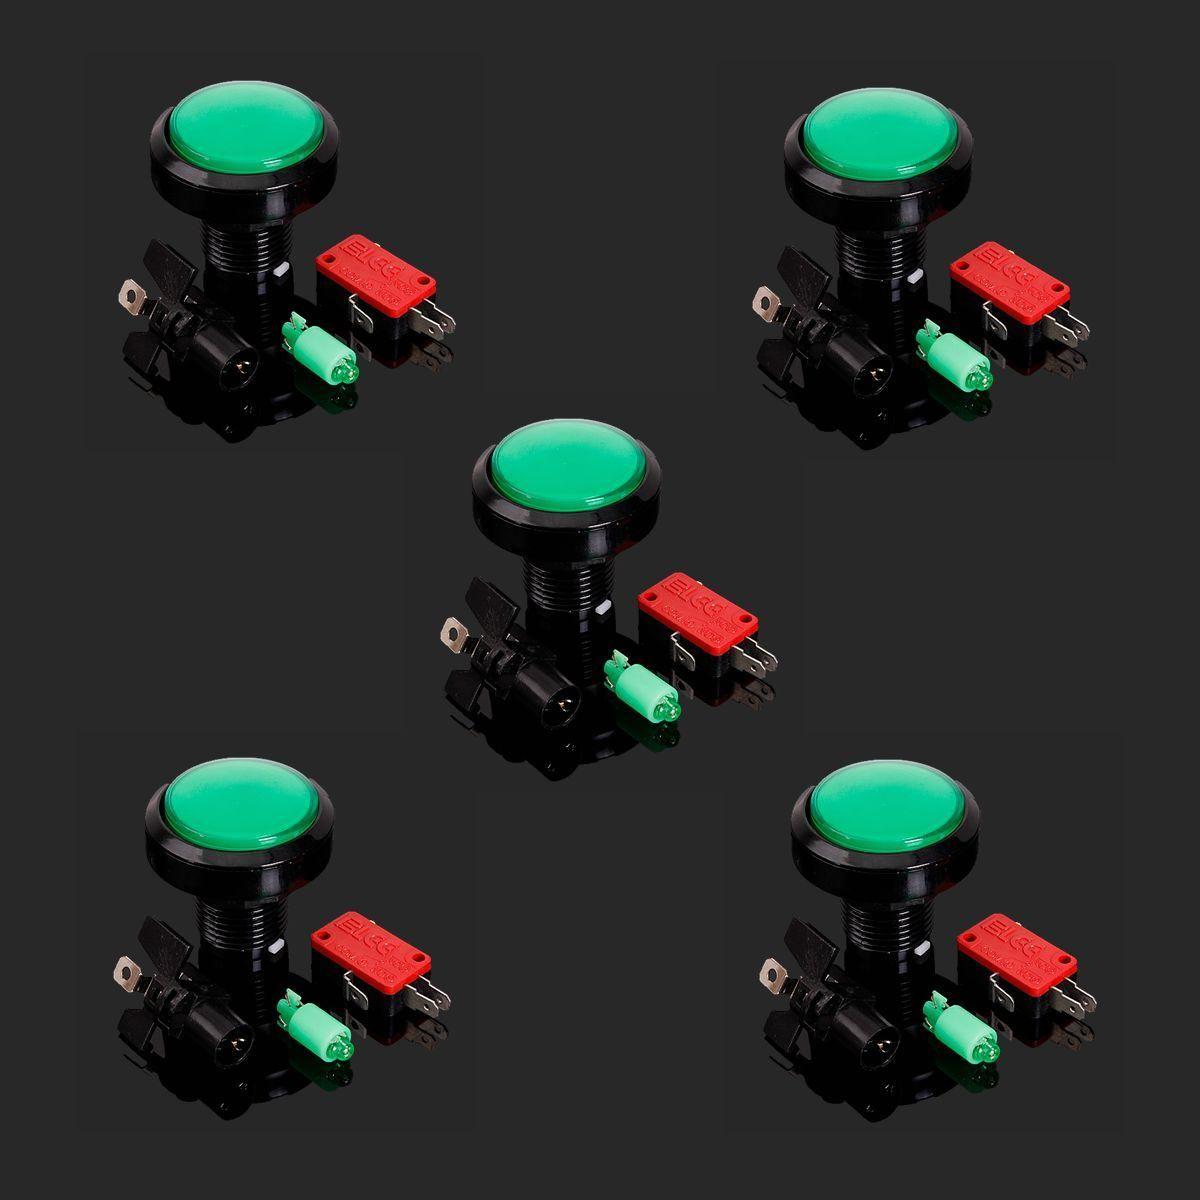 Push Button LED Light Lamp Beads Illuminated For Arcade Video Game Machine